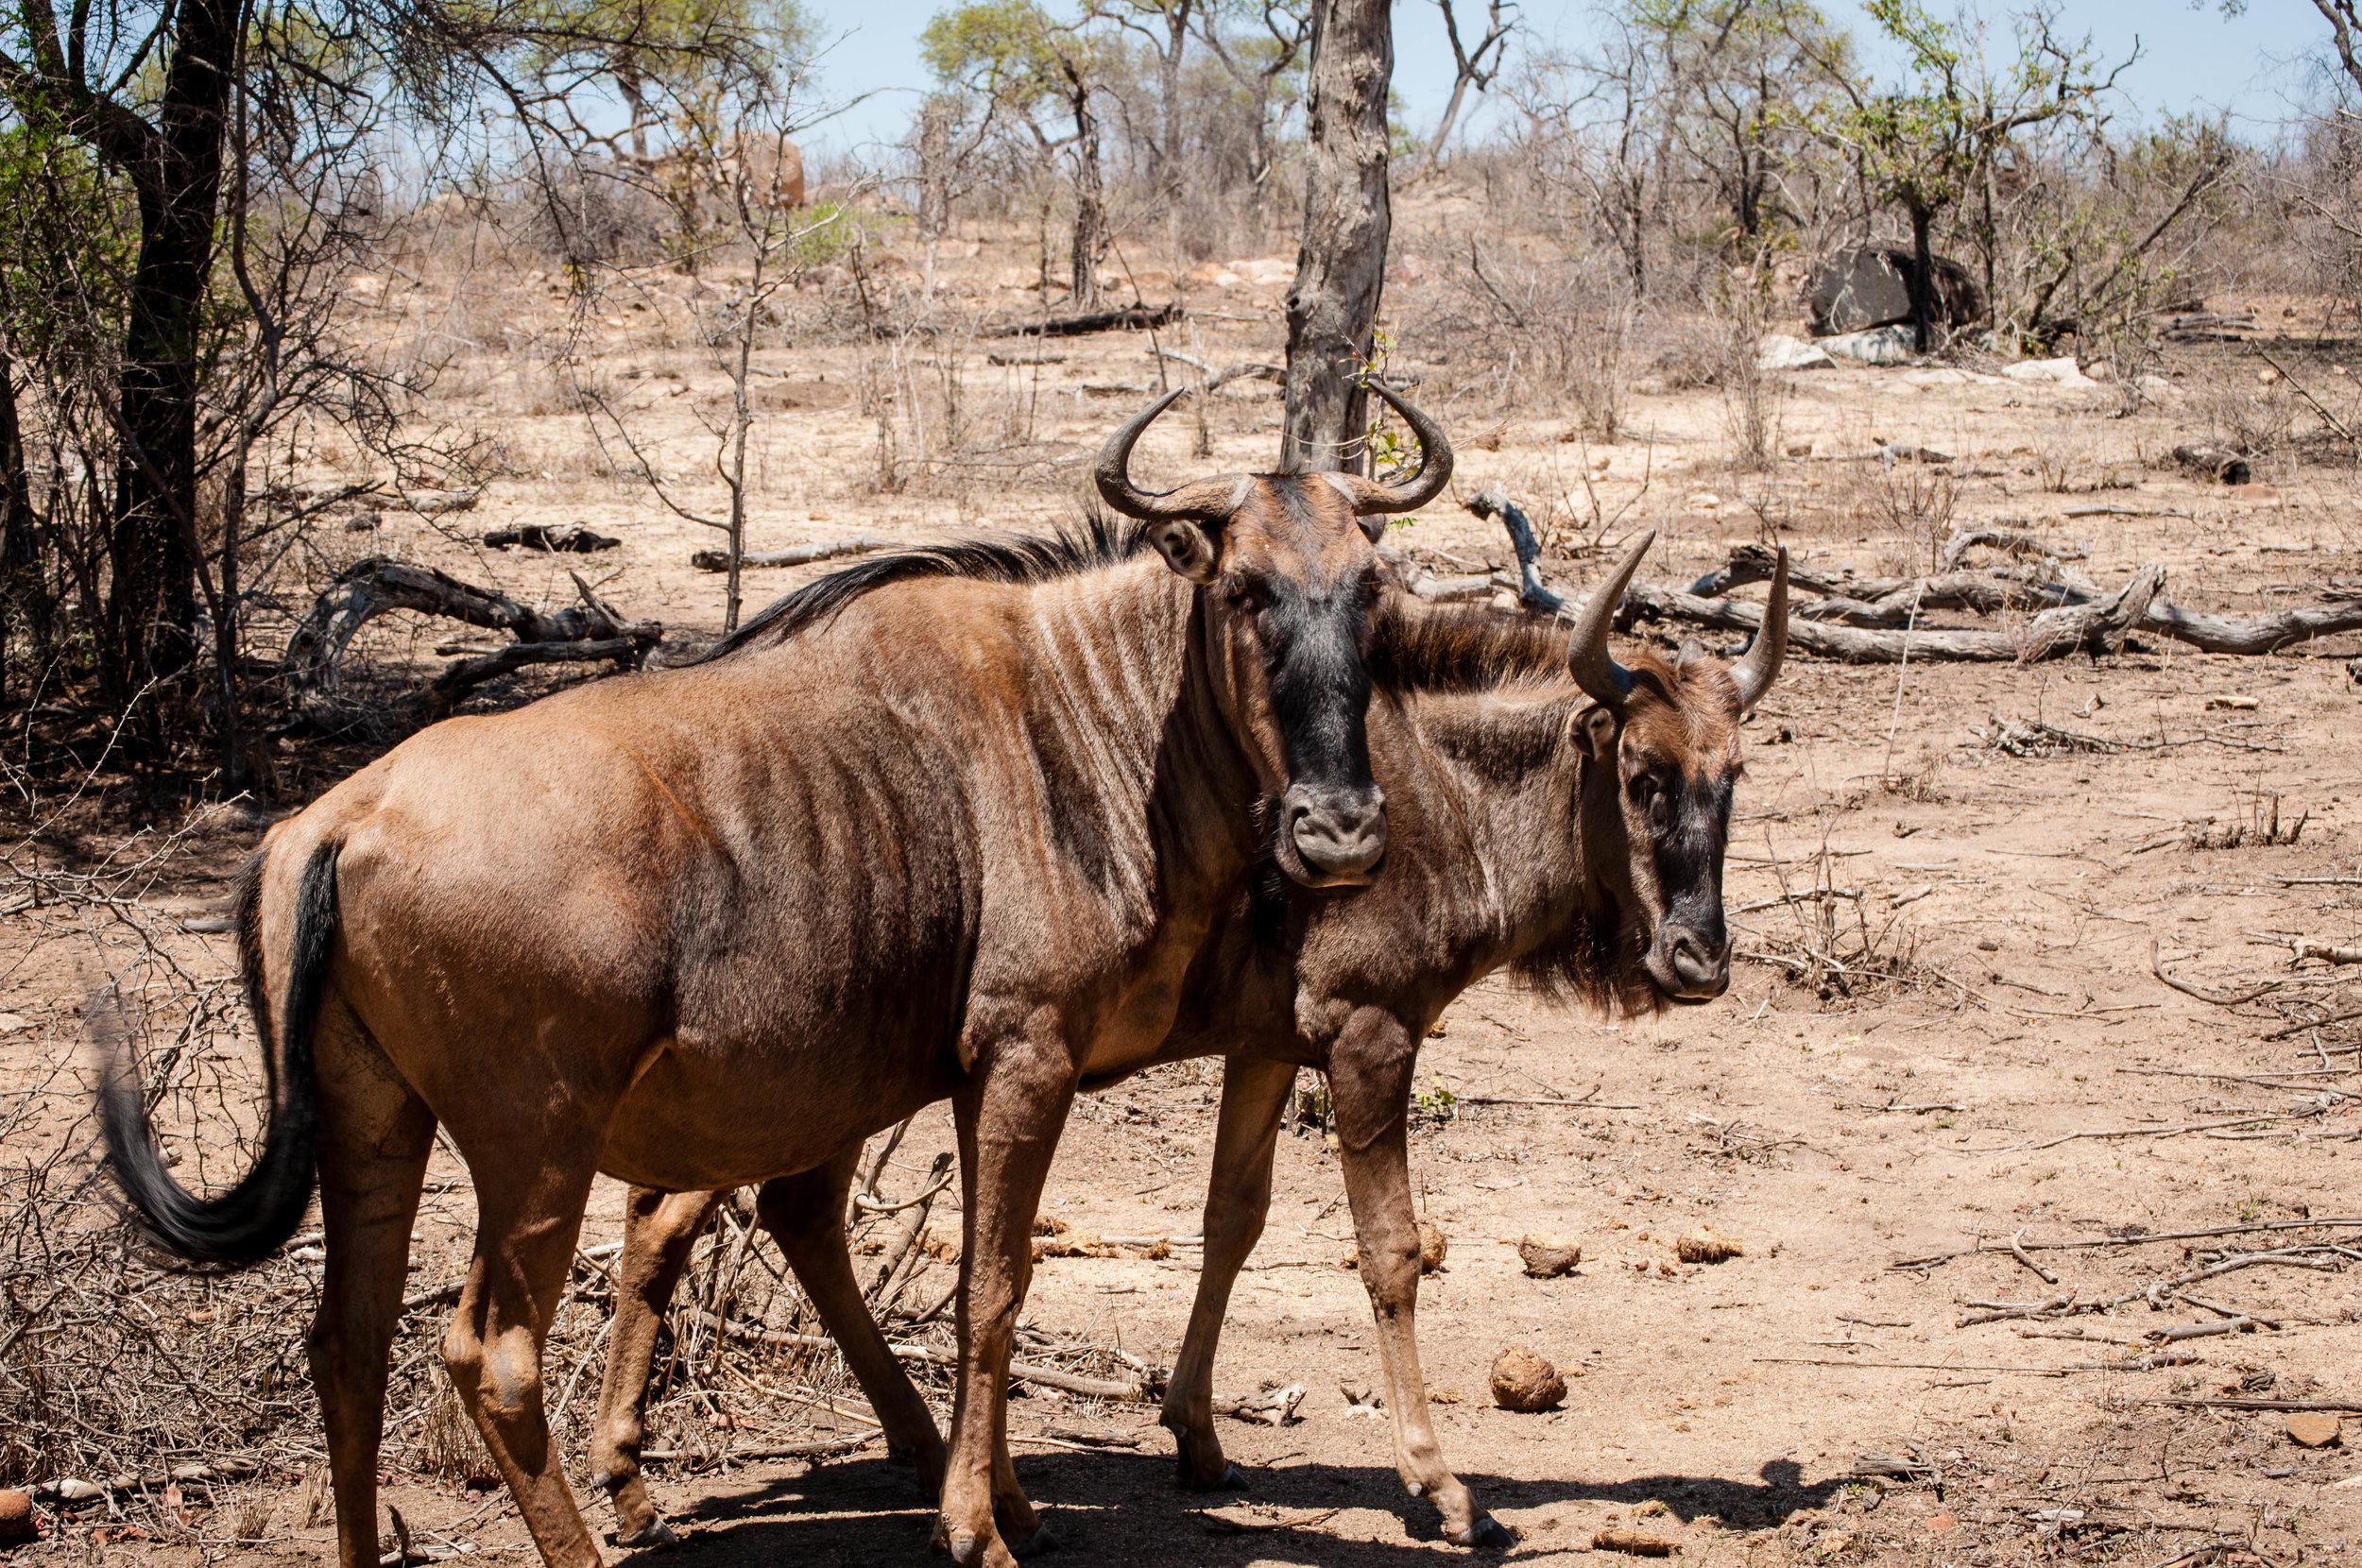 Animals at Kruger park. safari planner